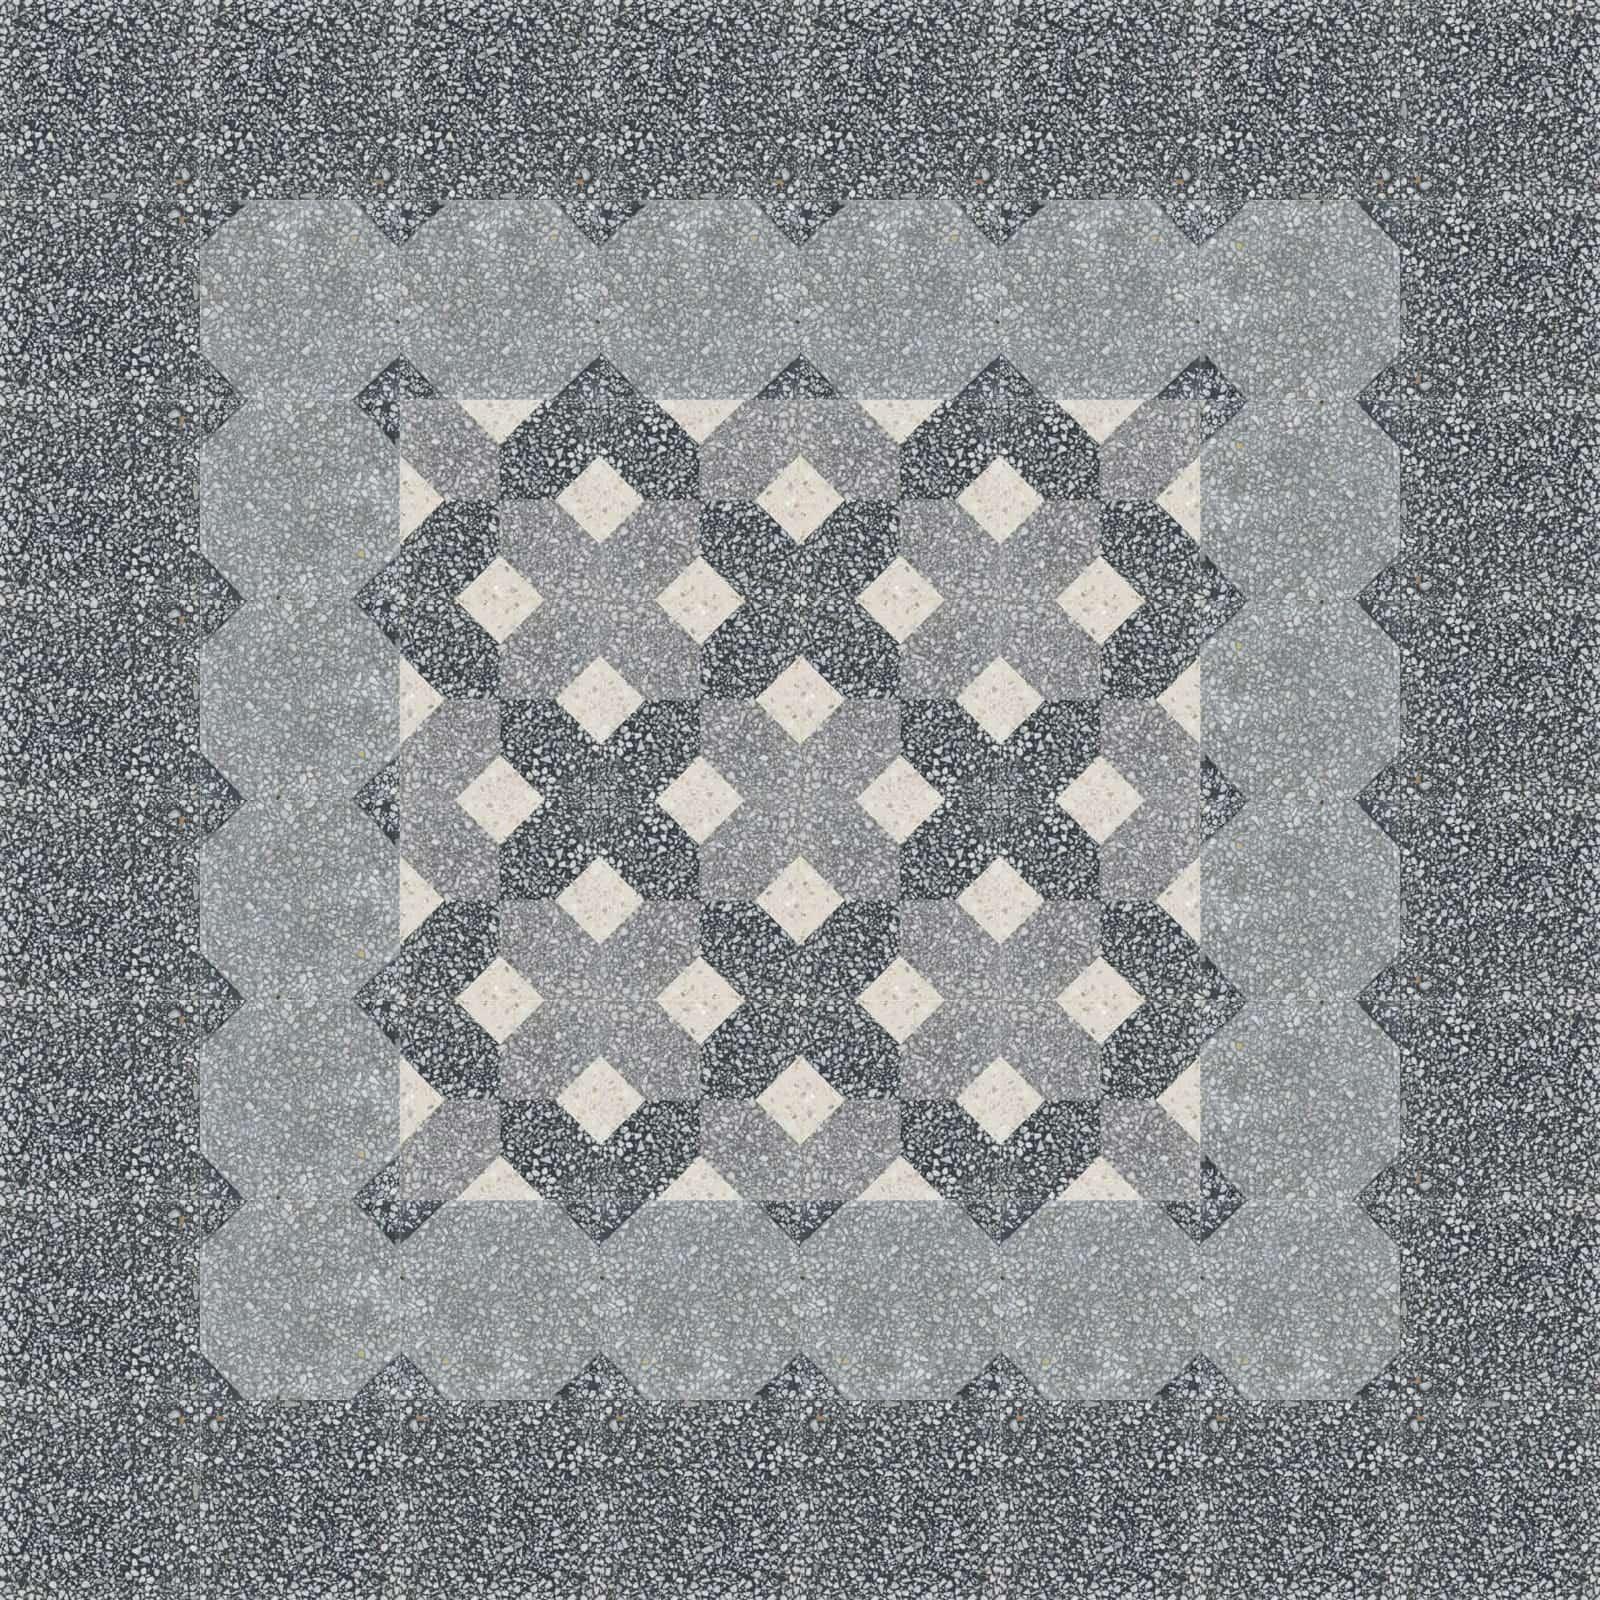 VIA_Terrazzo Grob Platten_20x20cm_910601_verlegemuster_C   910601